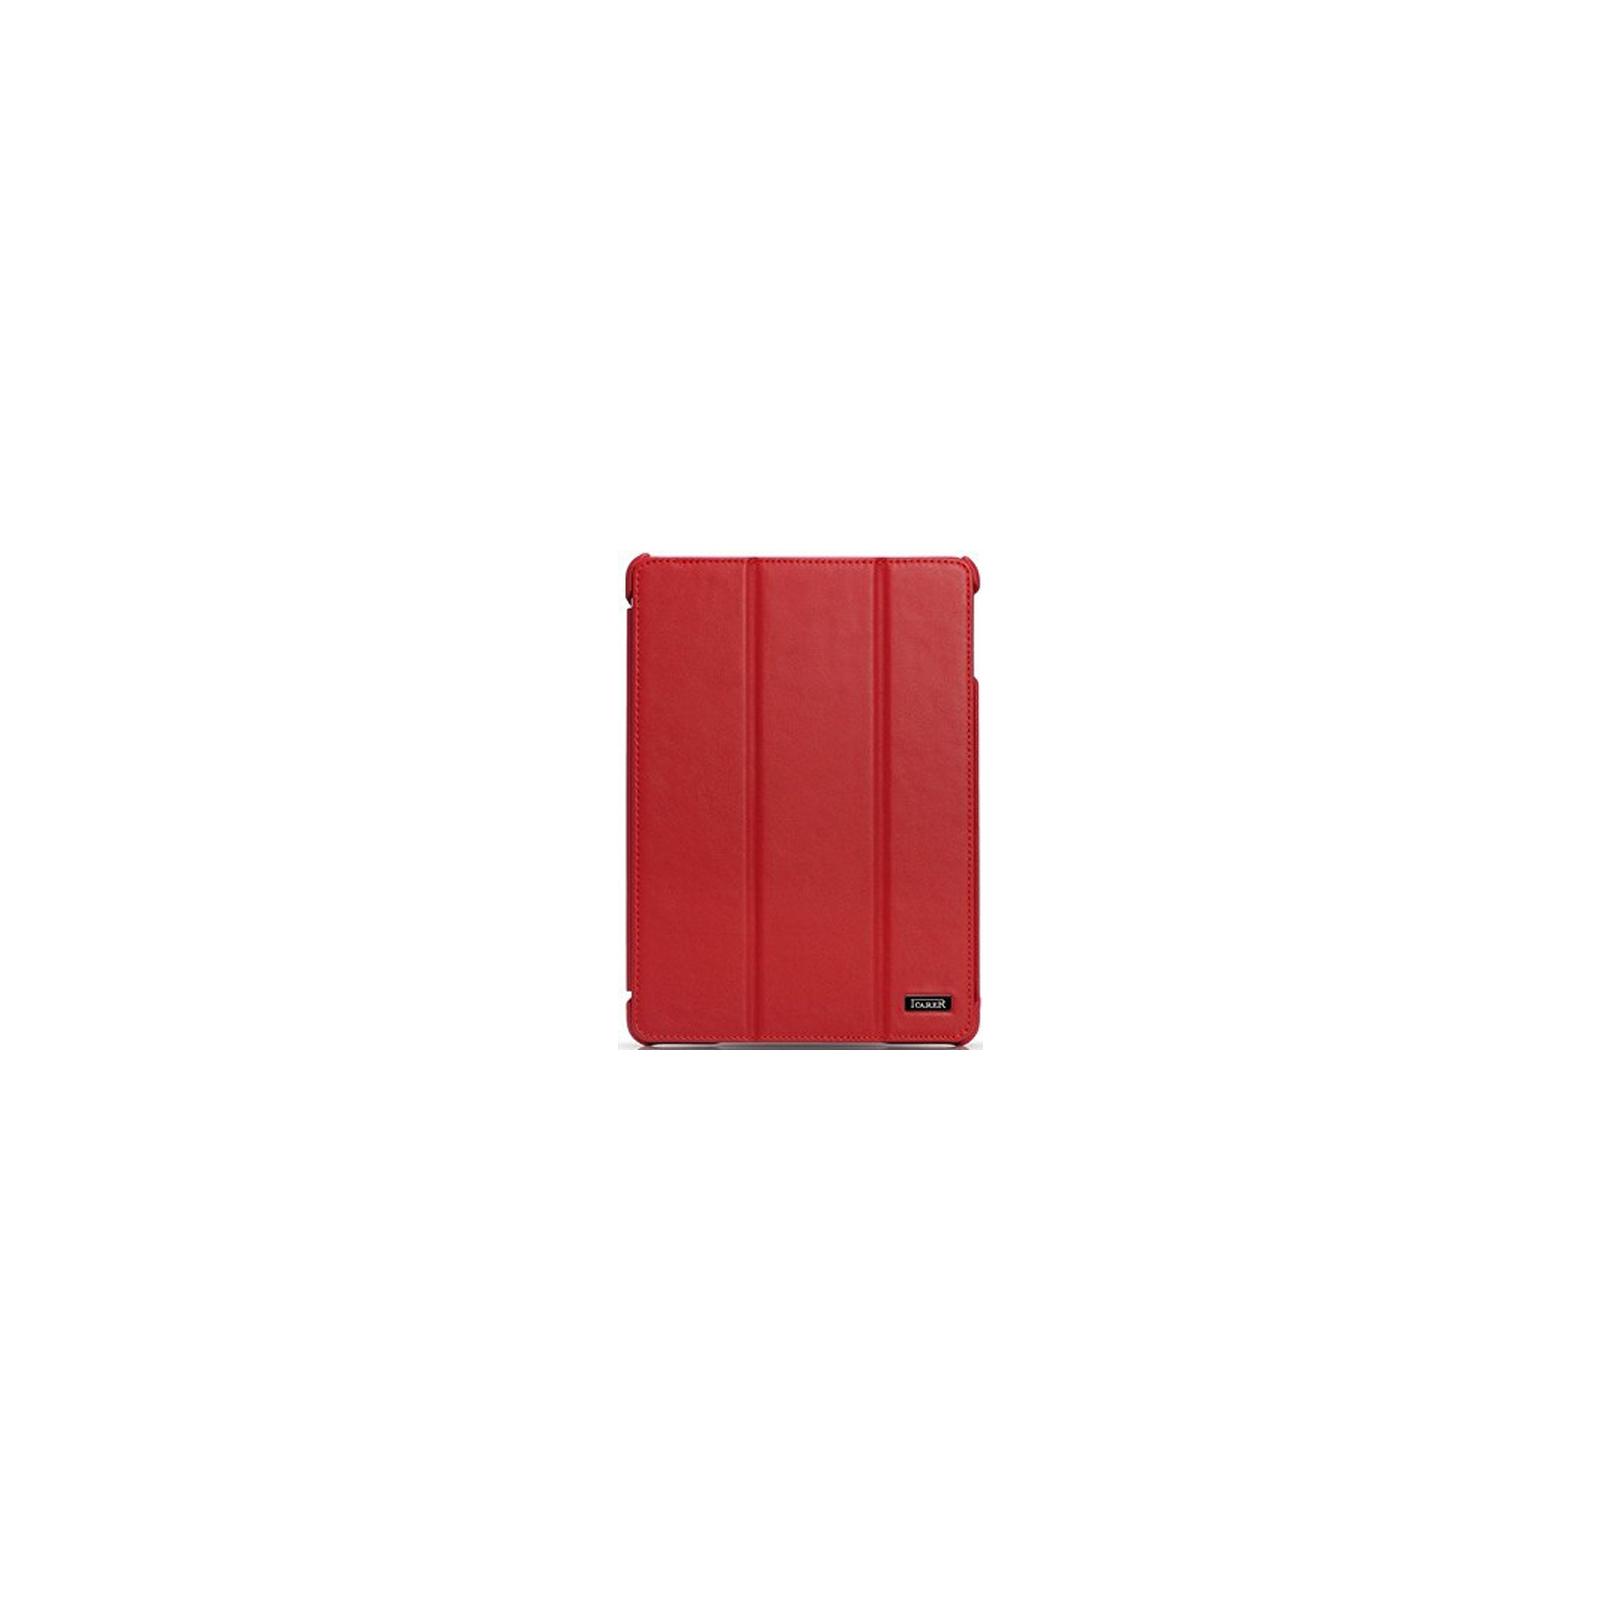 Чехол для планшета i-Carer iPad Air Ultra thin genuine leather series red (RID501red)